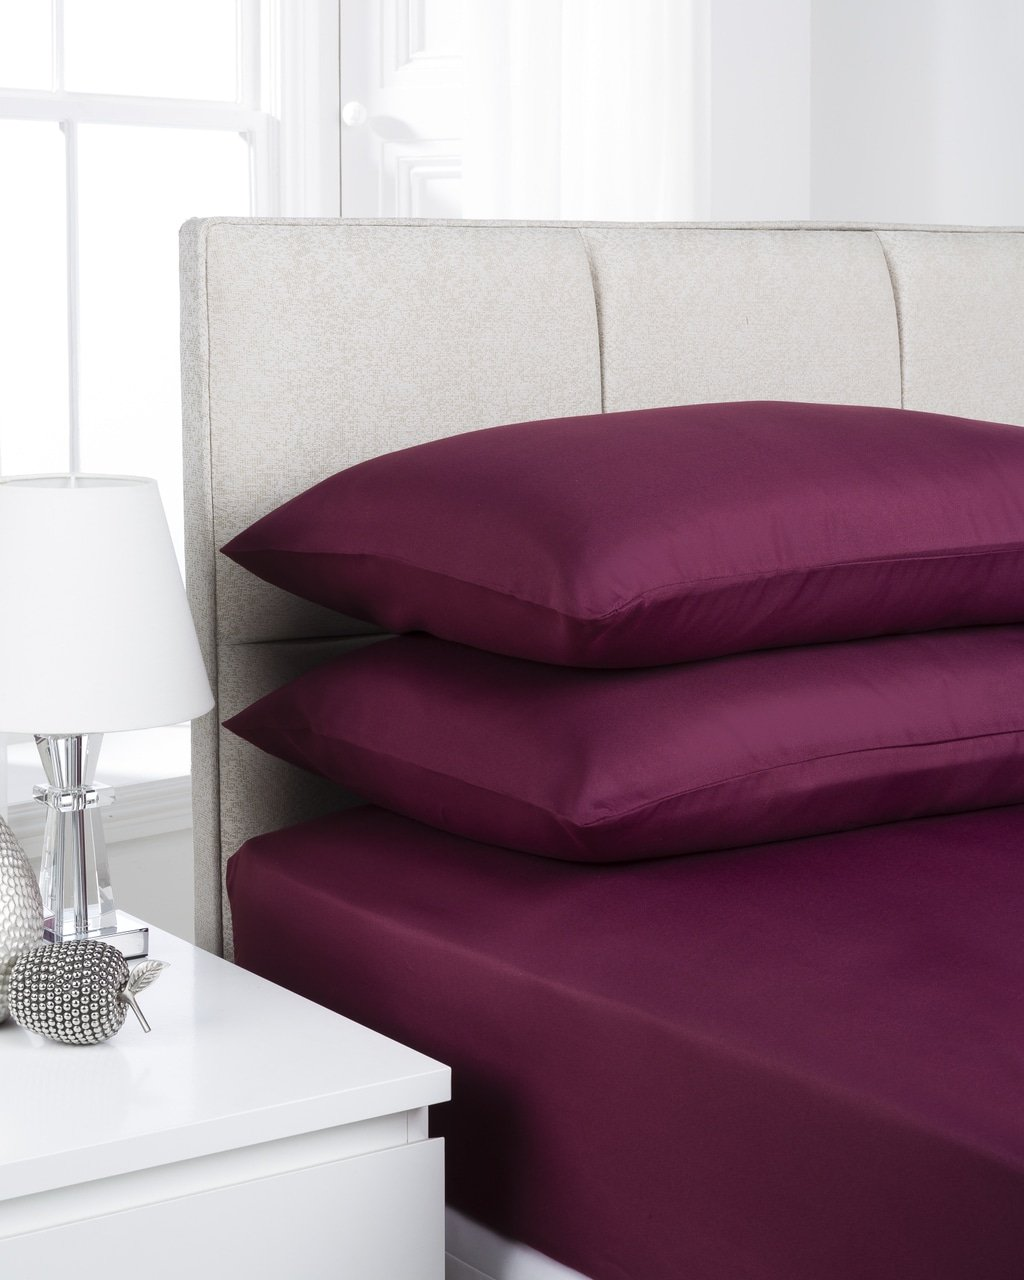 aubergine plain dye flat sheet single double king. Black Bedroom Furniture Sets. Home Design Ideas